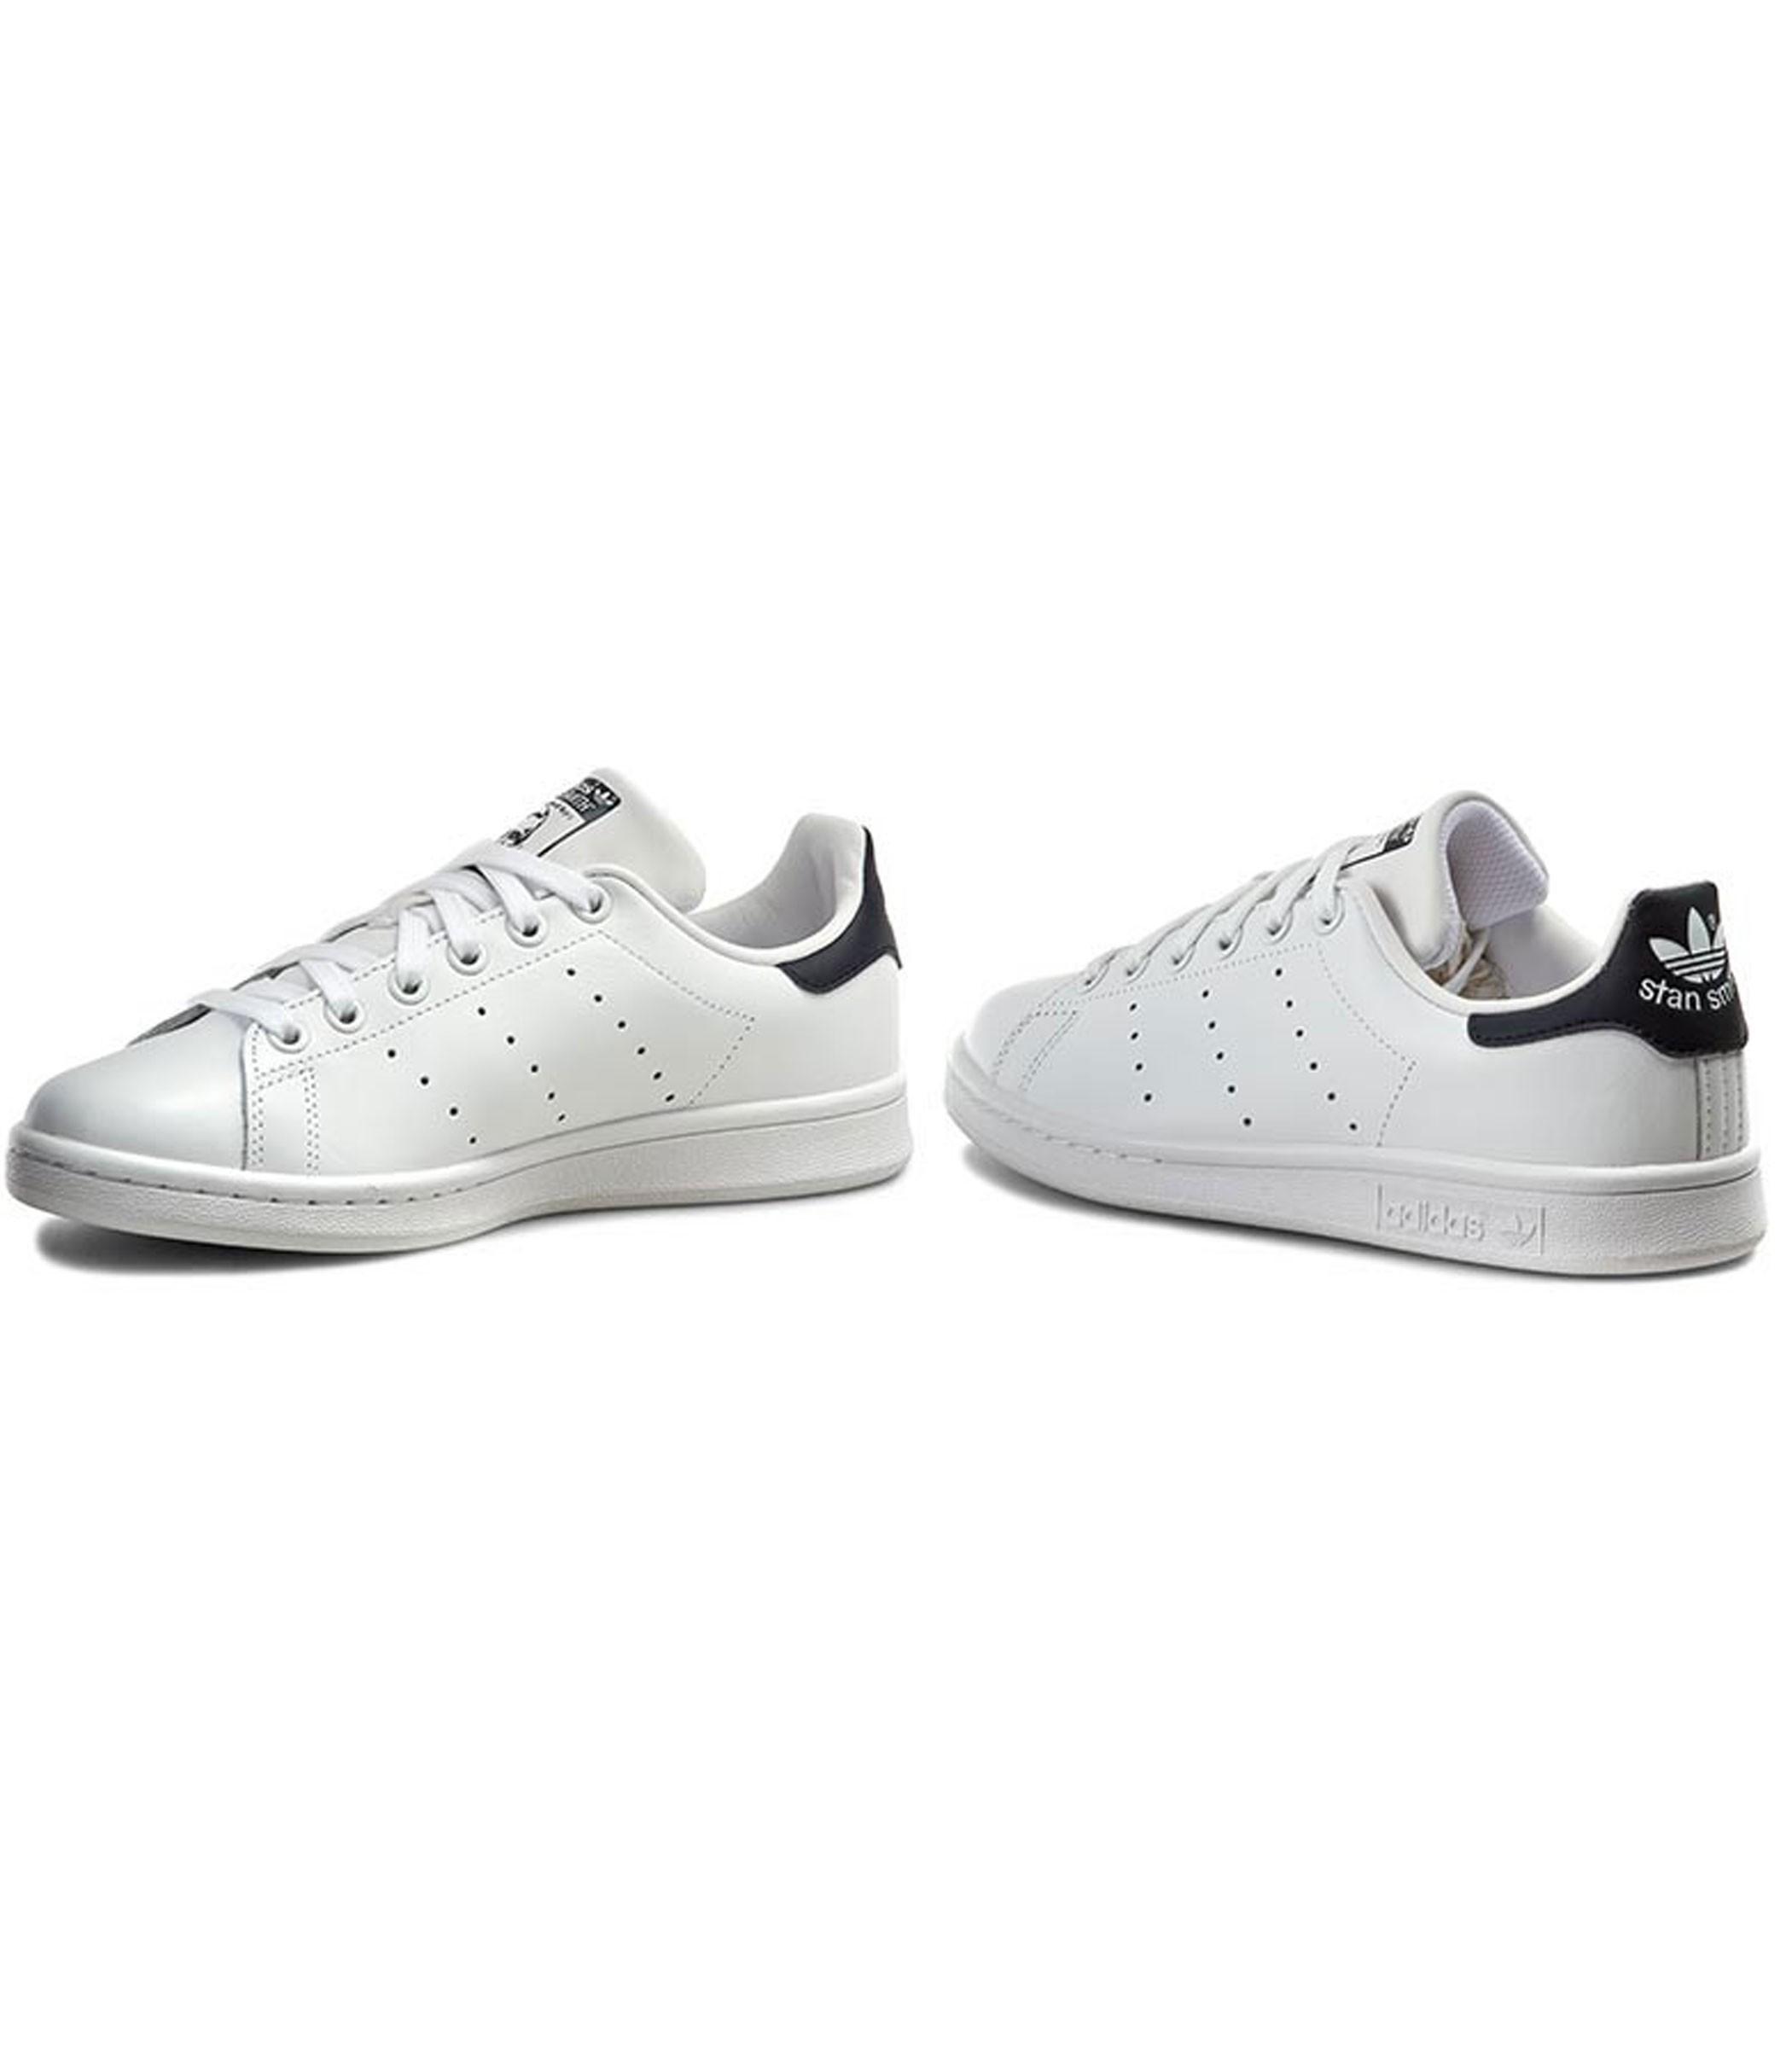 reputable site 45fa9 3a765 Scarpe Stan Smith Adidas da uomo bianco blu rif.M20325